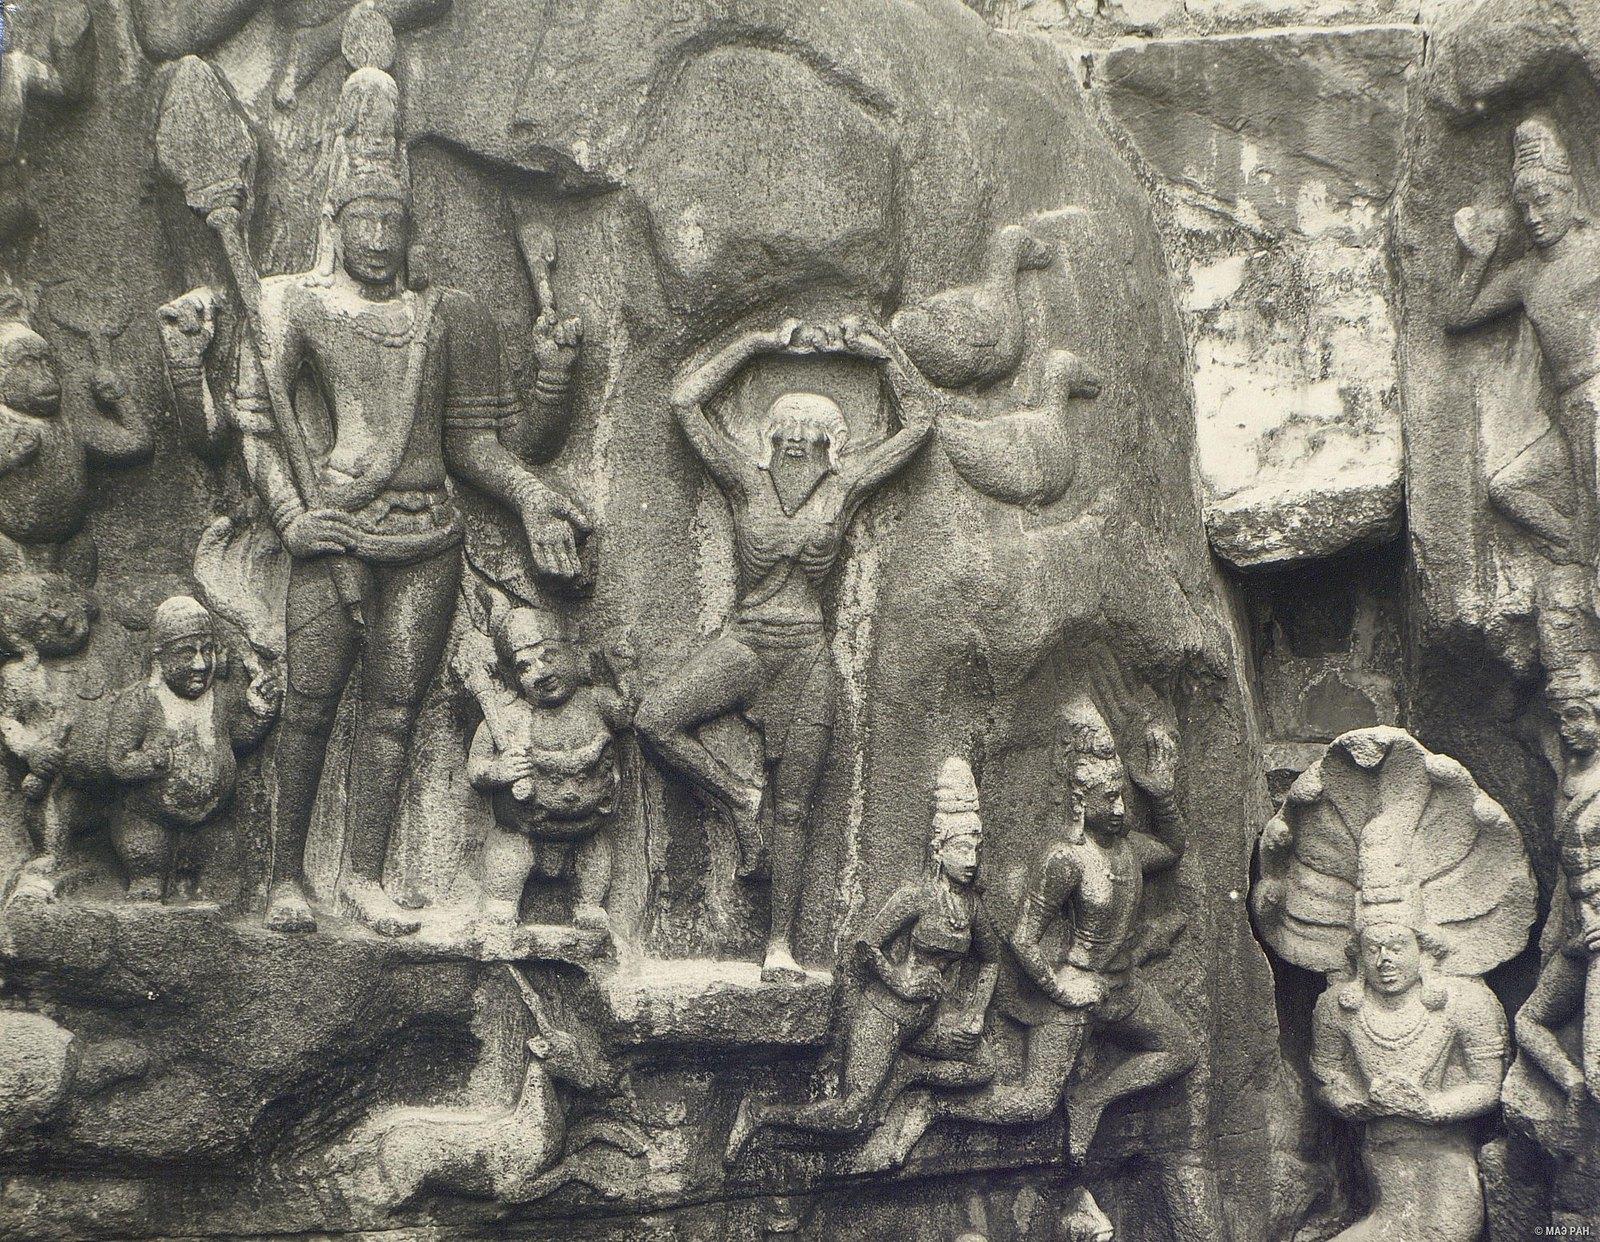 Мамаллапур (общий план скалы с изображениями)